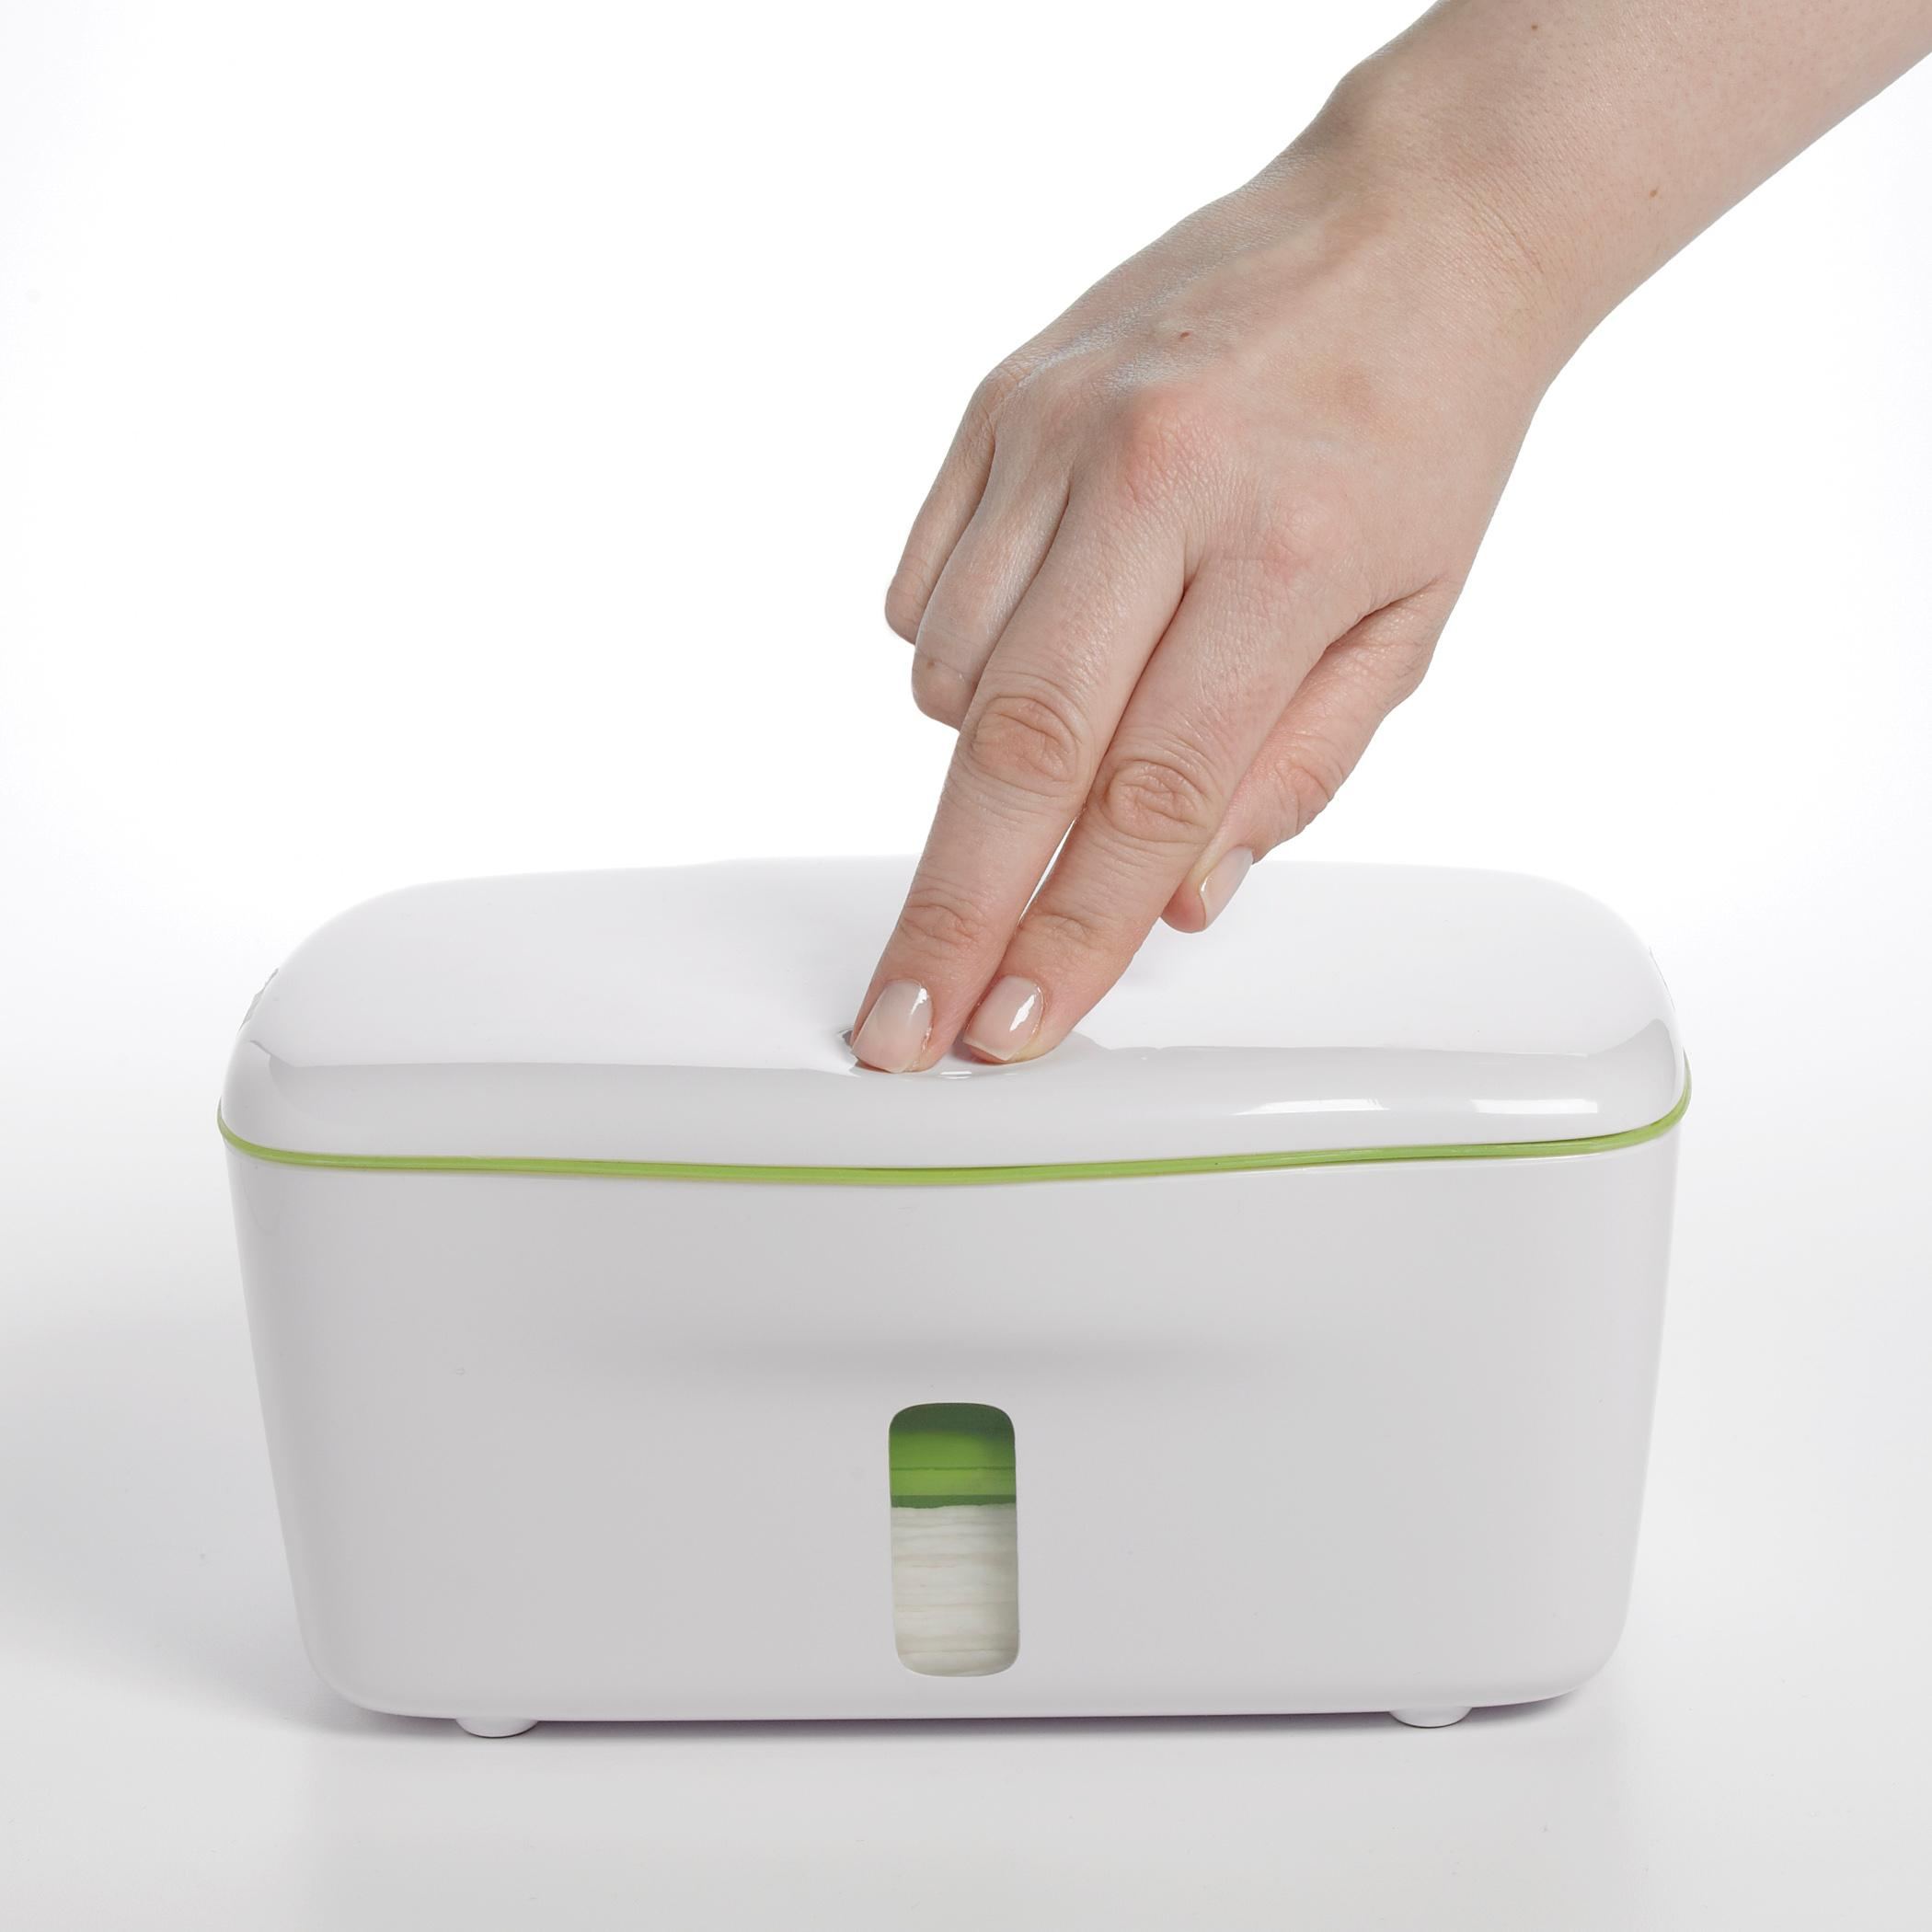 Amazon.com : OXO Tot PerfectPull(TM) Wipes Dispenser with